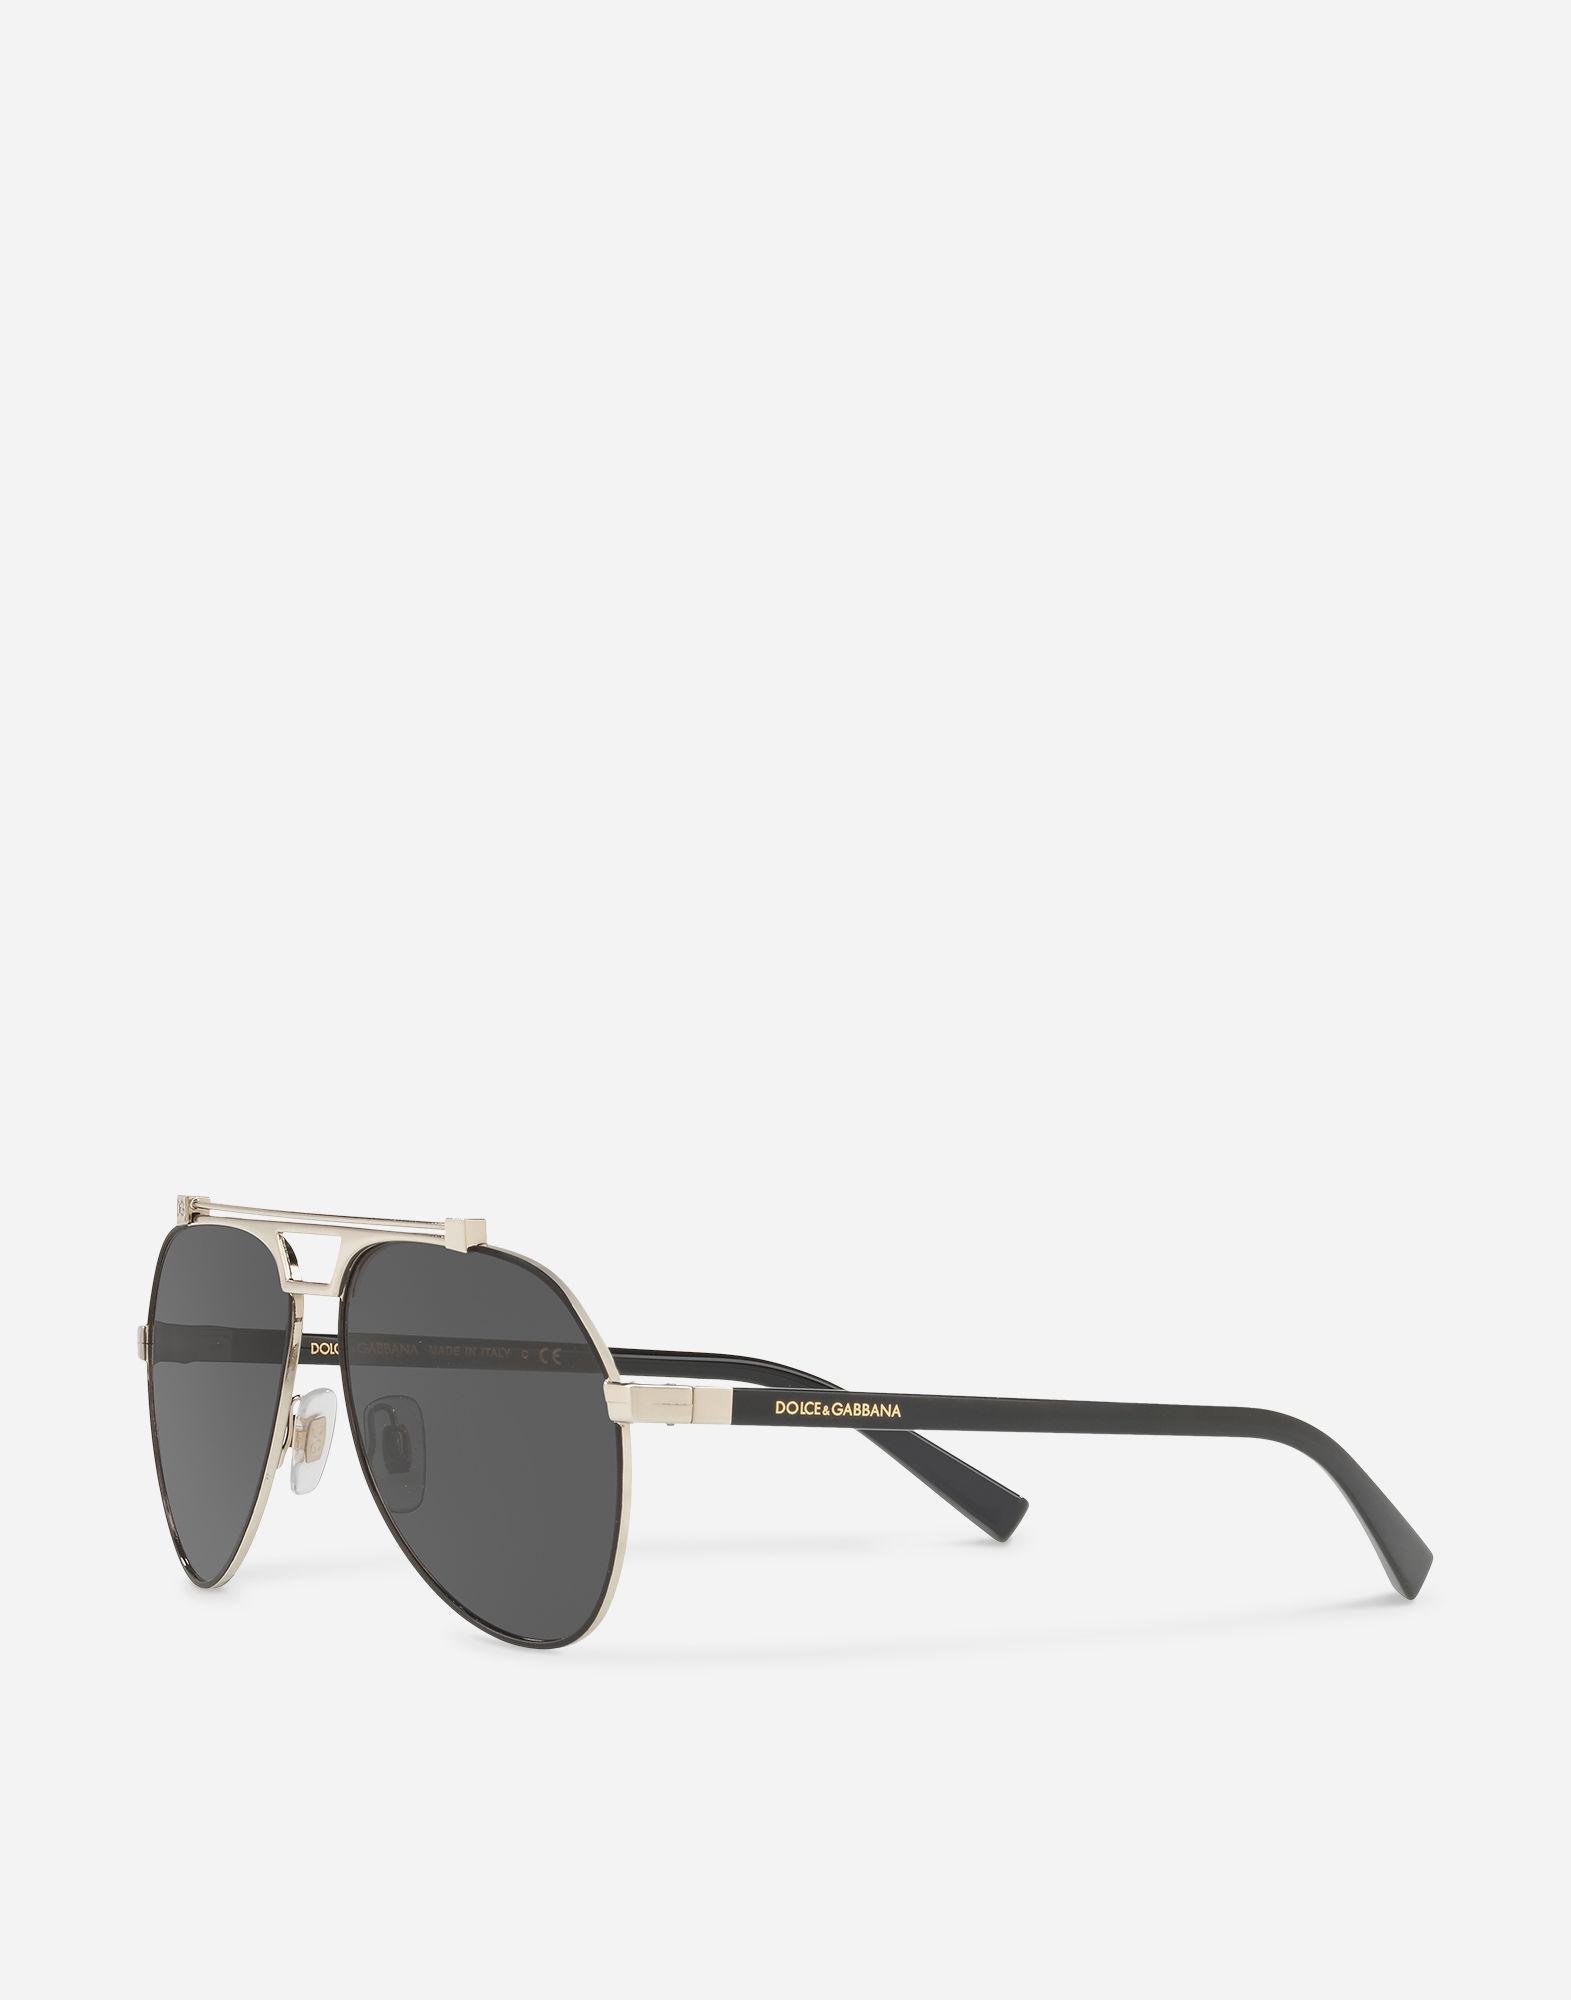 a1e8fdf8a62f Lyst - Dolce   Gabbana Shiny Metal Aviator Sunglasses in Metallic ...